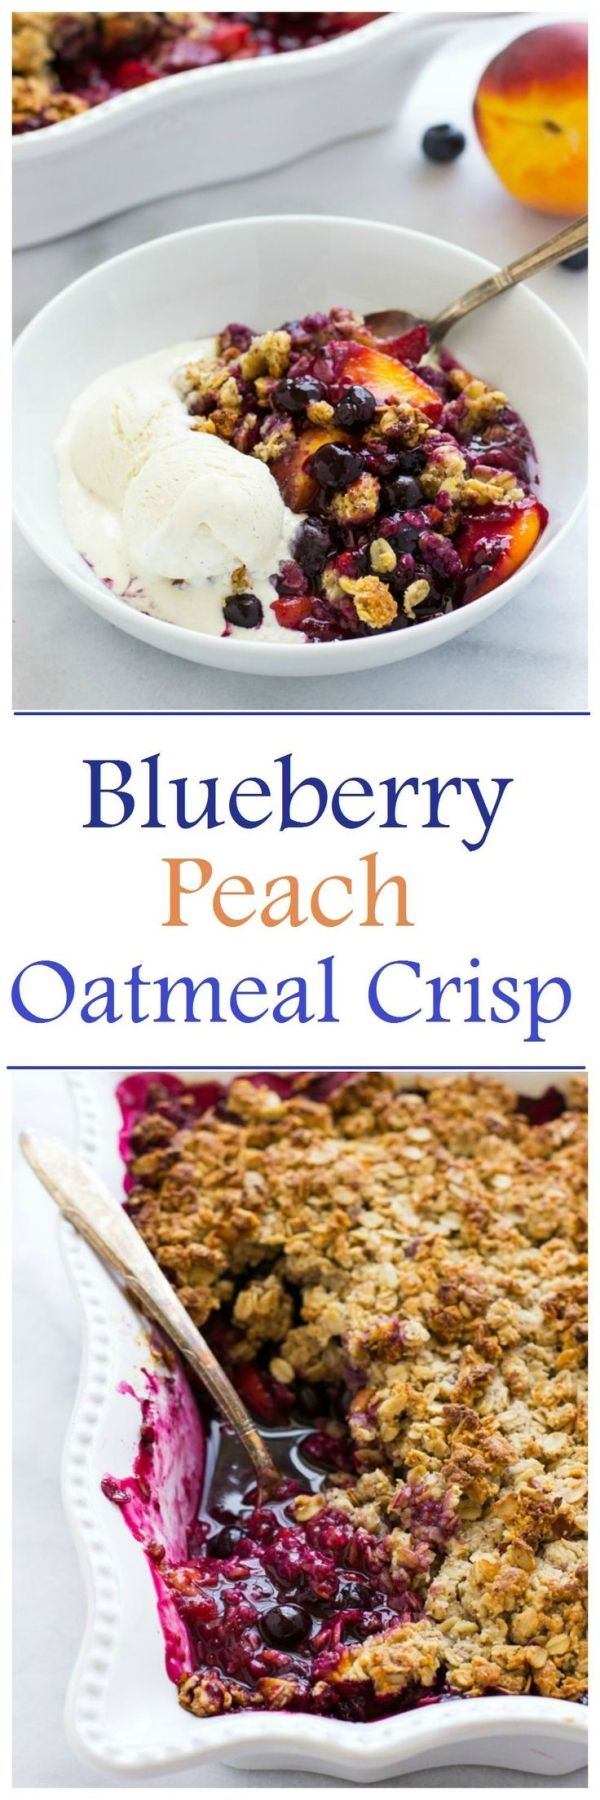 Blueberry Peach Oatmeal Crisp- serve with vanilla bean ice cream for the best summer dessert EVER! #glutenfree #refinedsugarfree by bianca